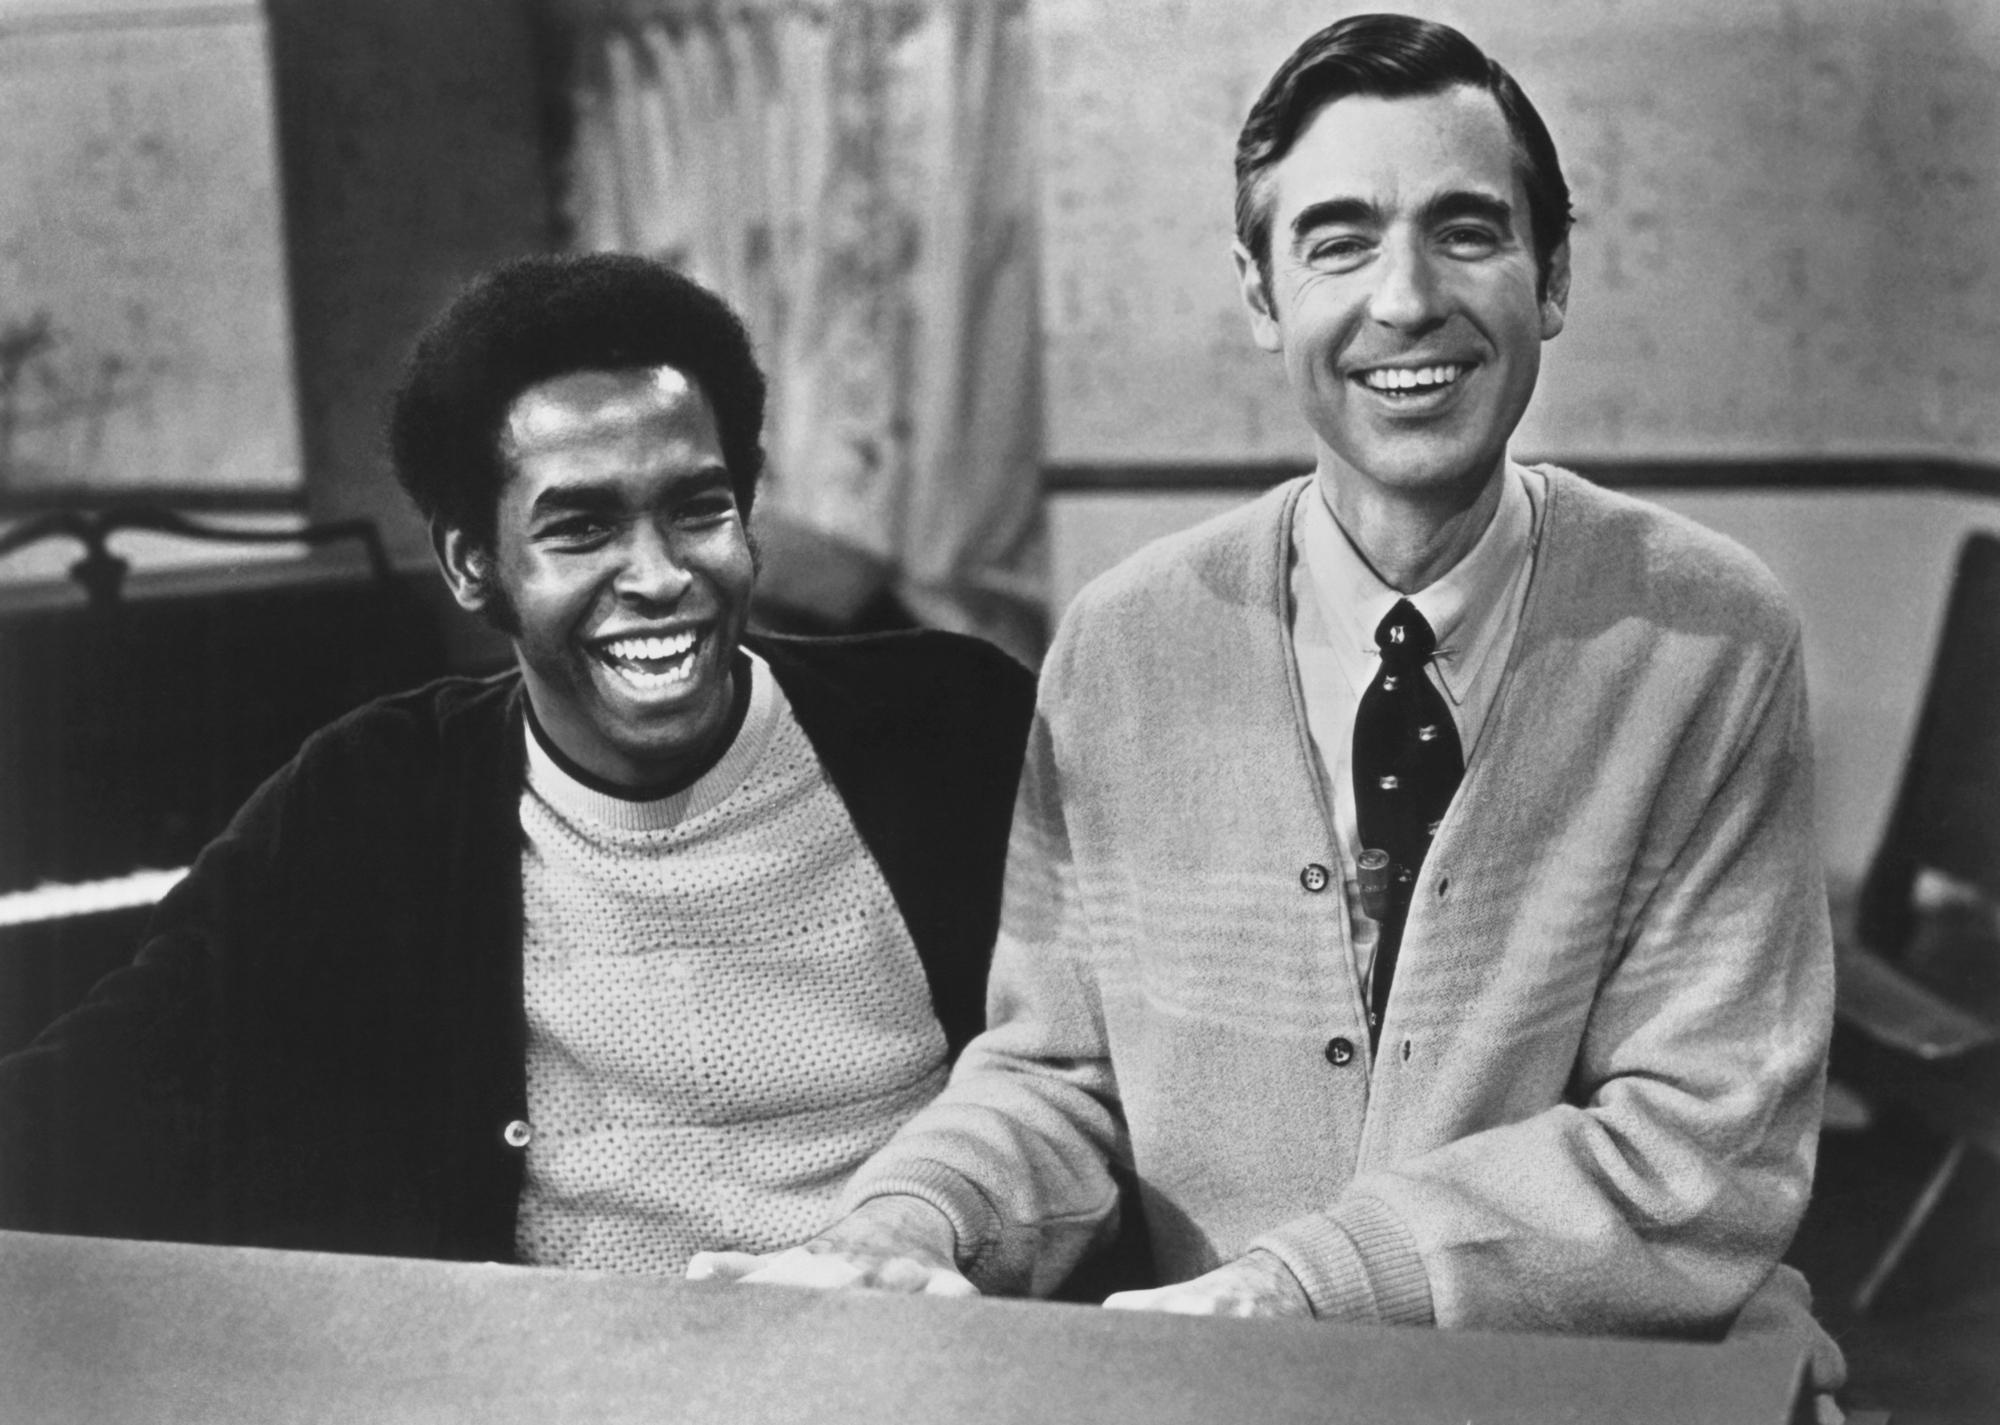 MISTER ROGERS' NEIGHBORHOOD, from left: Francois Clemons, Fred Rogers, 1972 photo, 1966-2001